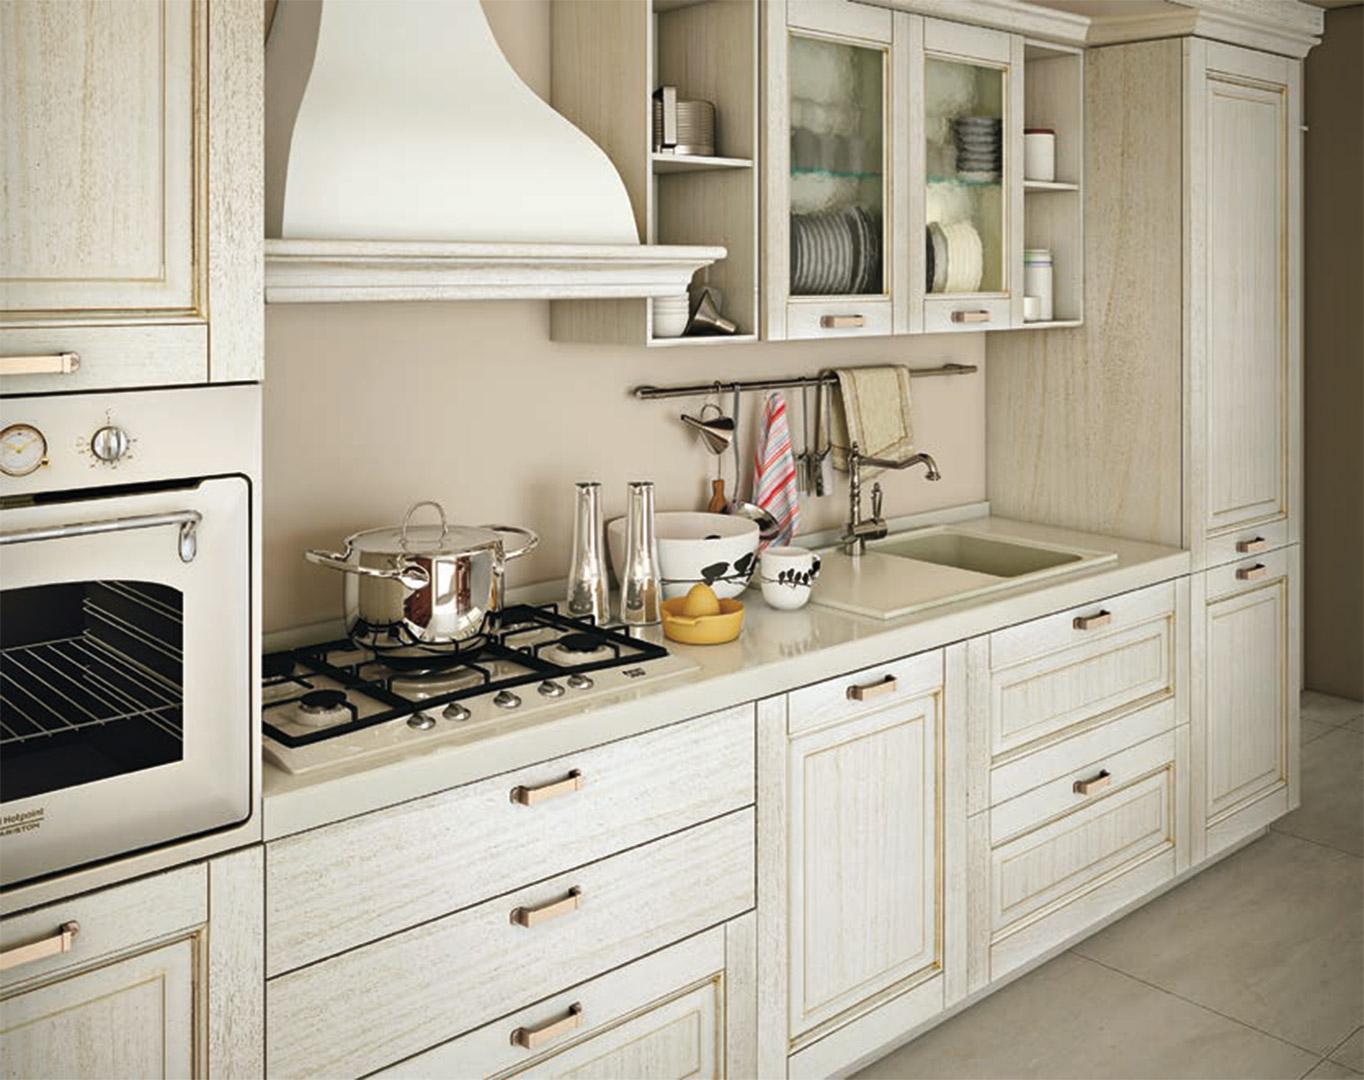 Cucina classica lube oprah creo kitchens - Cucine lube in offerta ...